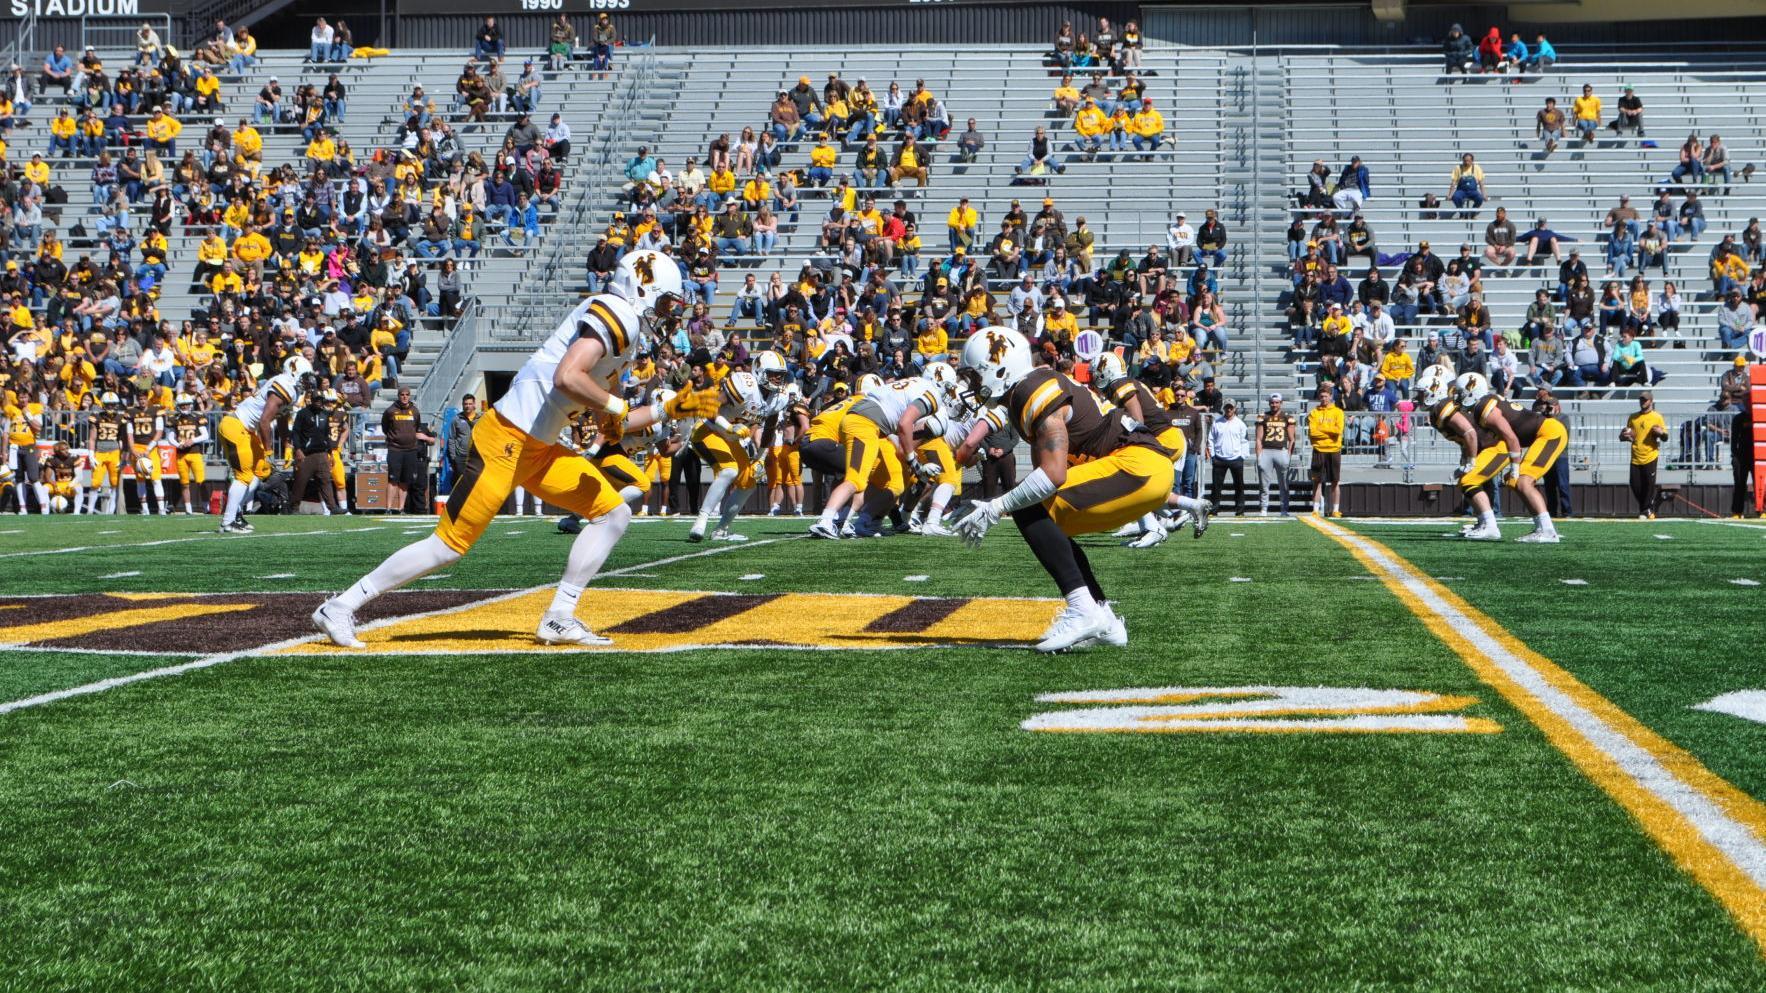 Wyoming football wraps up camp with Saturday's spring game at War Memorial Stadium